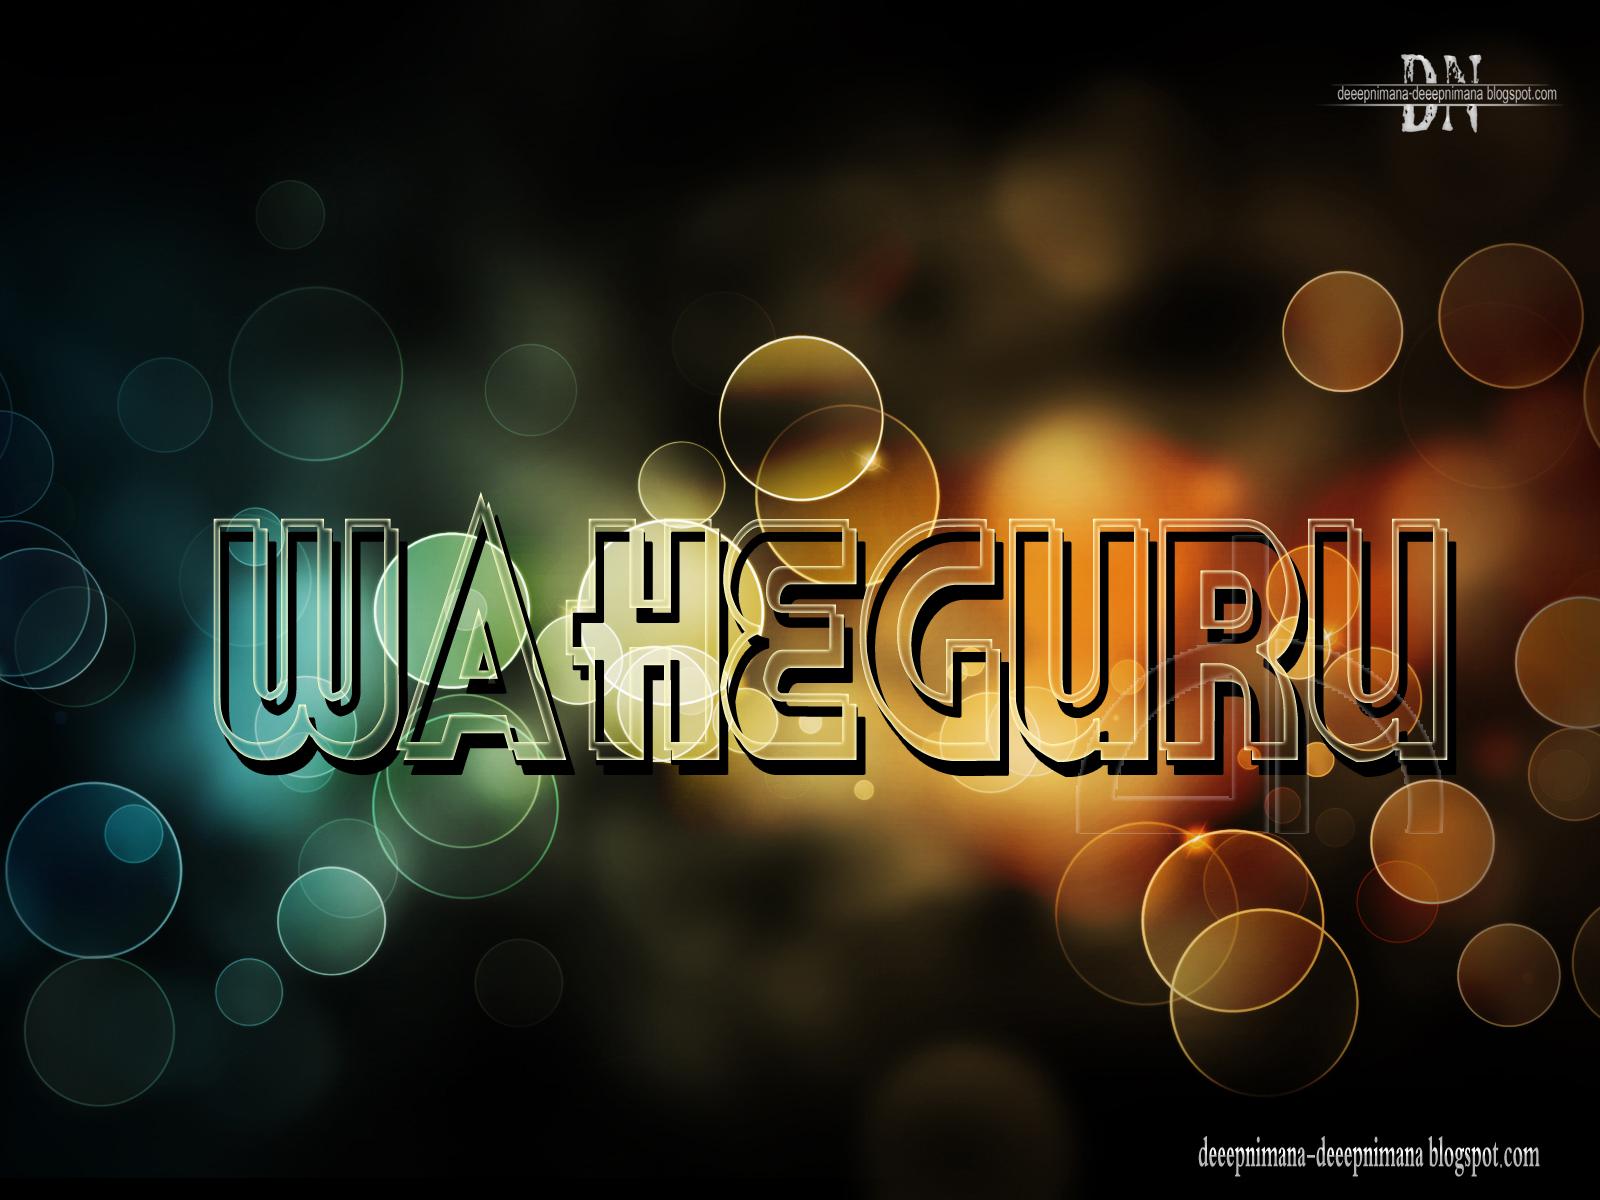 Waheguru Quotes Wallpaper Deeepnimana Deeepnimana Blogspot Com Waheguru Naam Simran